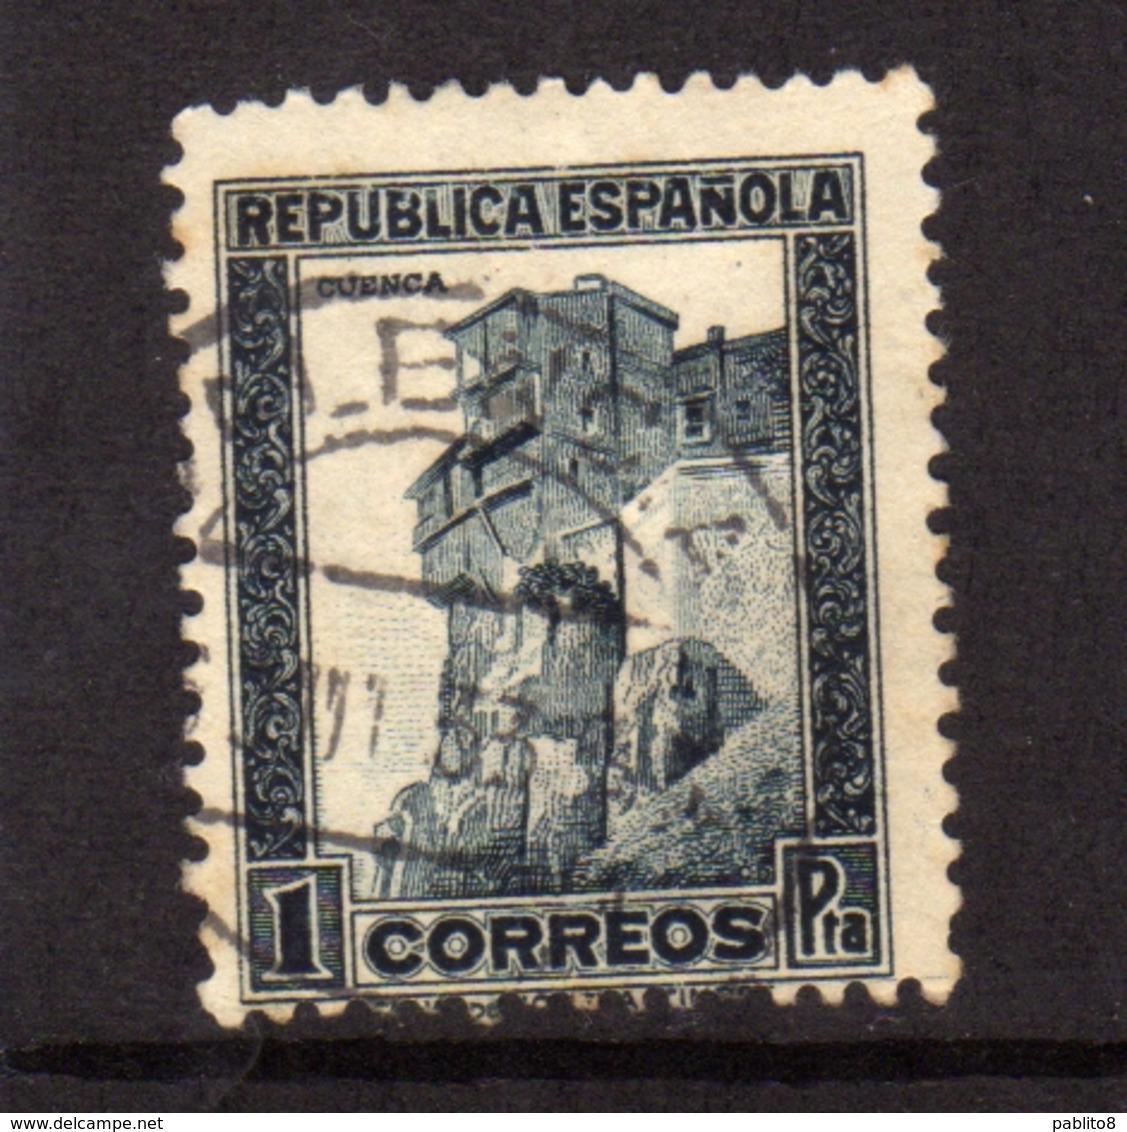 SPAIN ESPAÑA SPAGNA 1932 1938 CLIFF HUSES CUENCA PESETA 1p USATO USED OBLITERE' - 1889-1931 Regno: Alfonso XIII